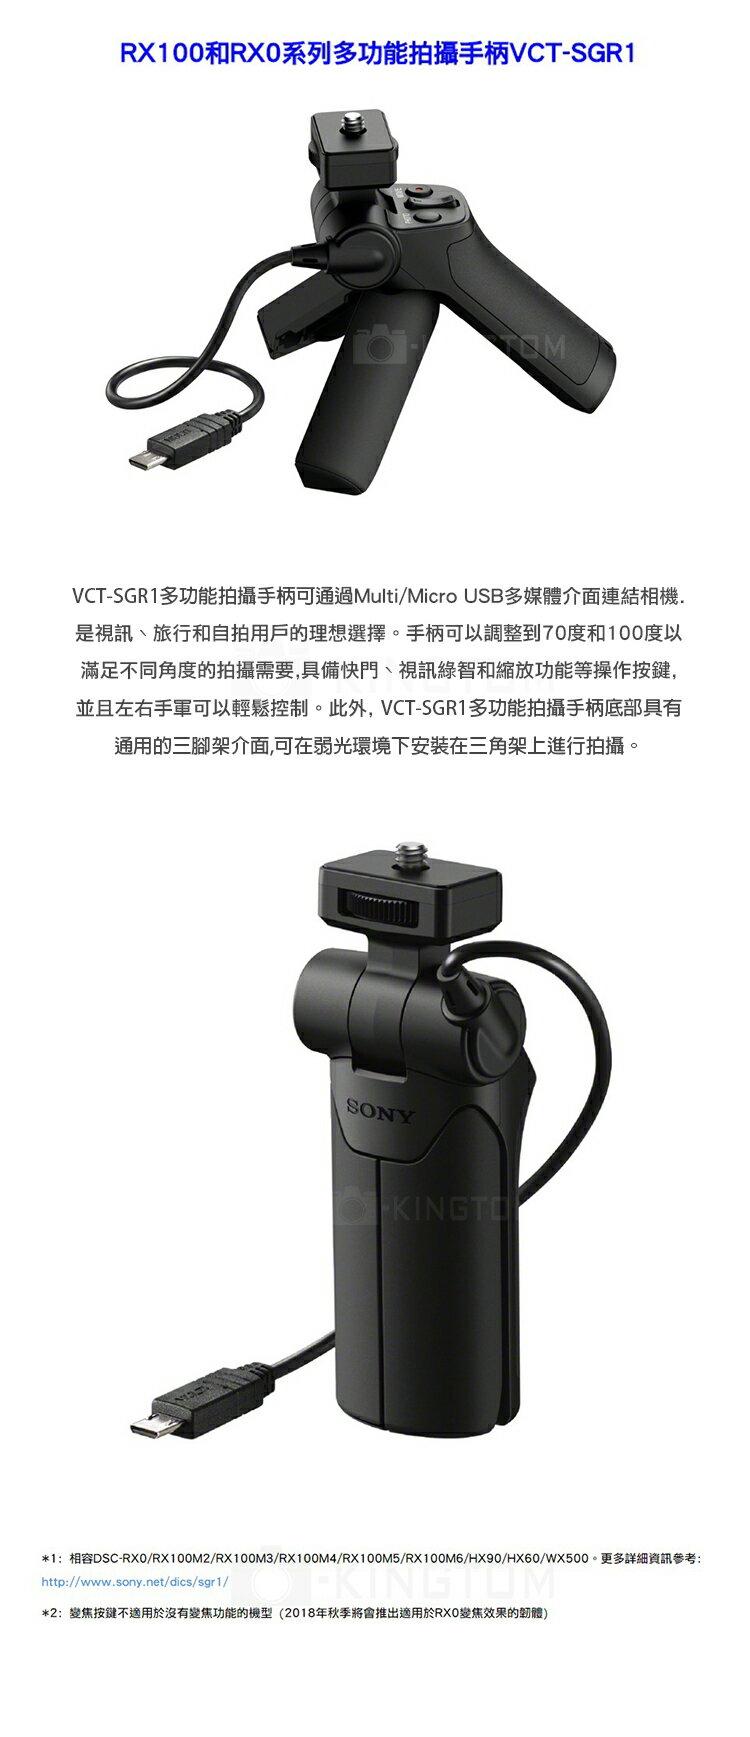 SONY DSC-RX0G 數位相機【24H快速出貨】 送64G卡+原廠ACC-TRDCJ電池組+清潔組+螢幕保護貼+MINI腳架+讀卡機 (公司貨) 分期零利率